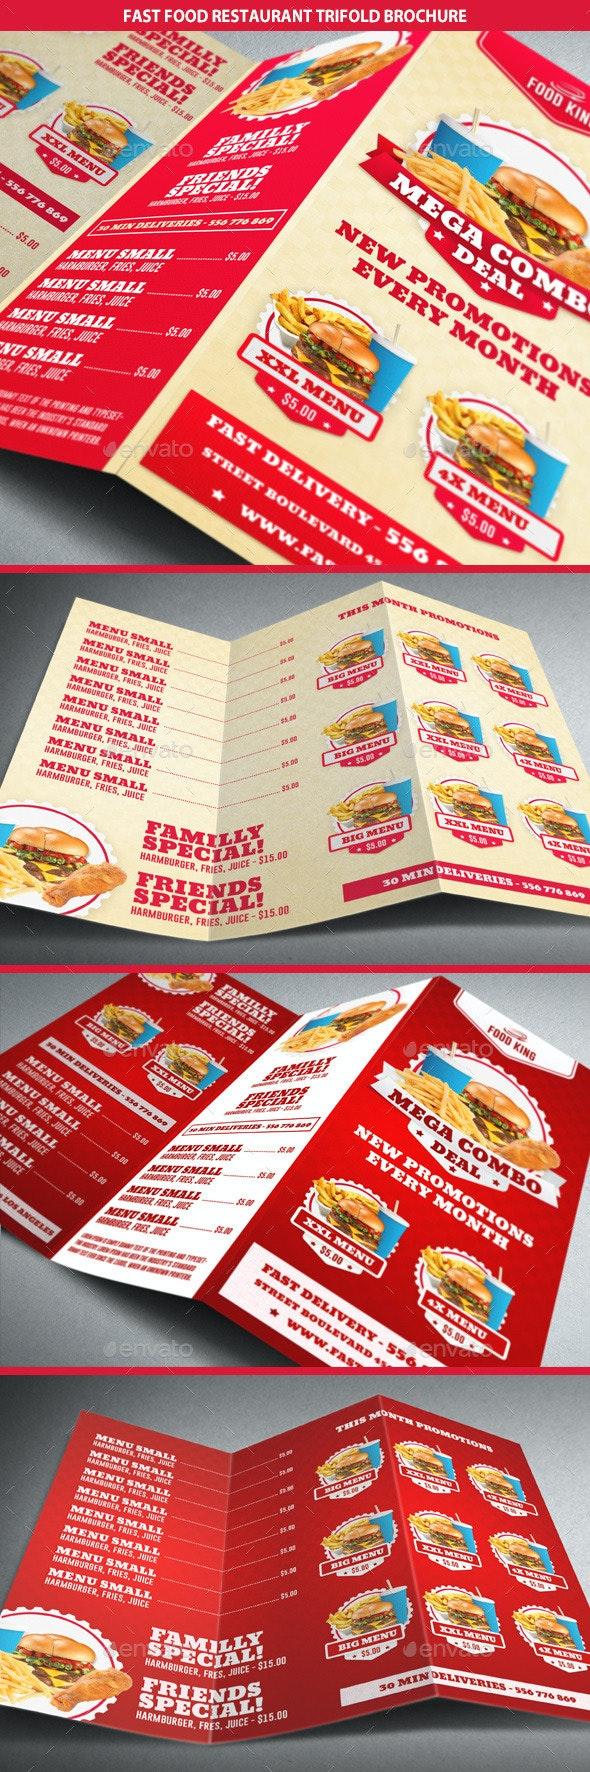 Restaurant Fast Food Menu Trifold Brochure - Brochures Print Templates